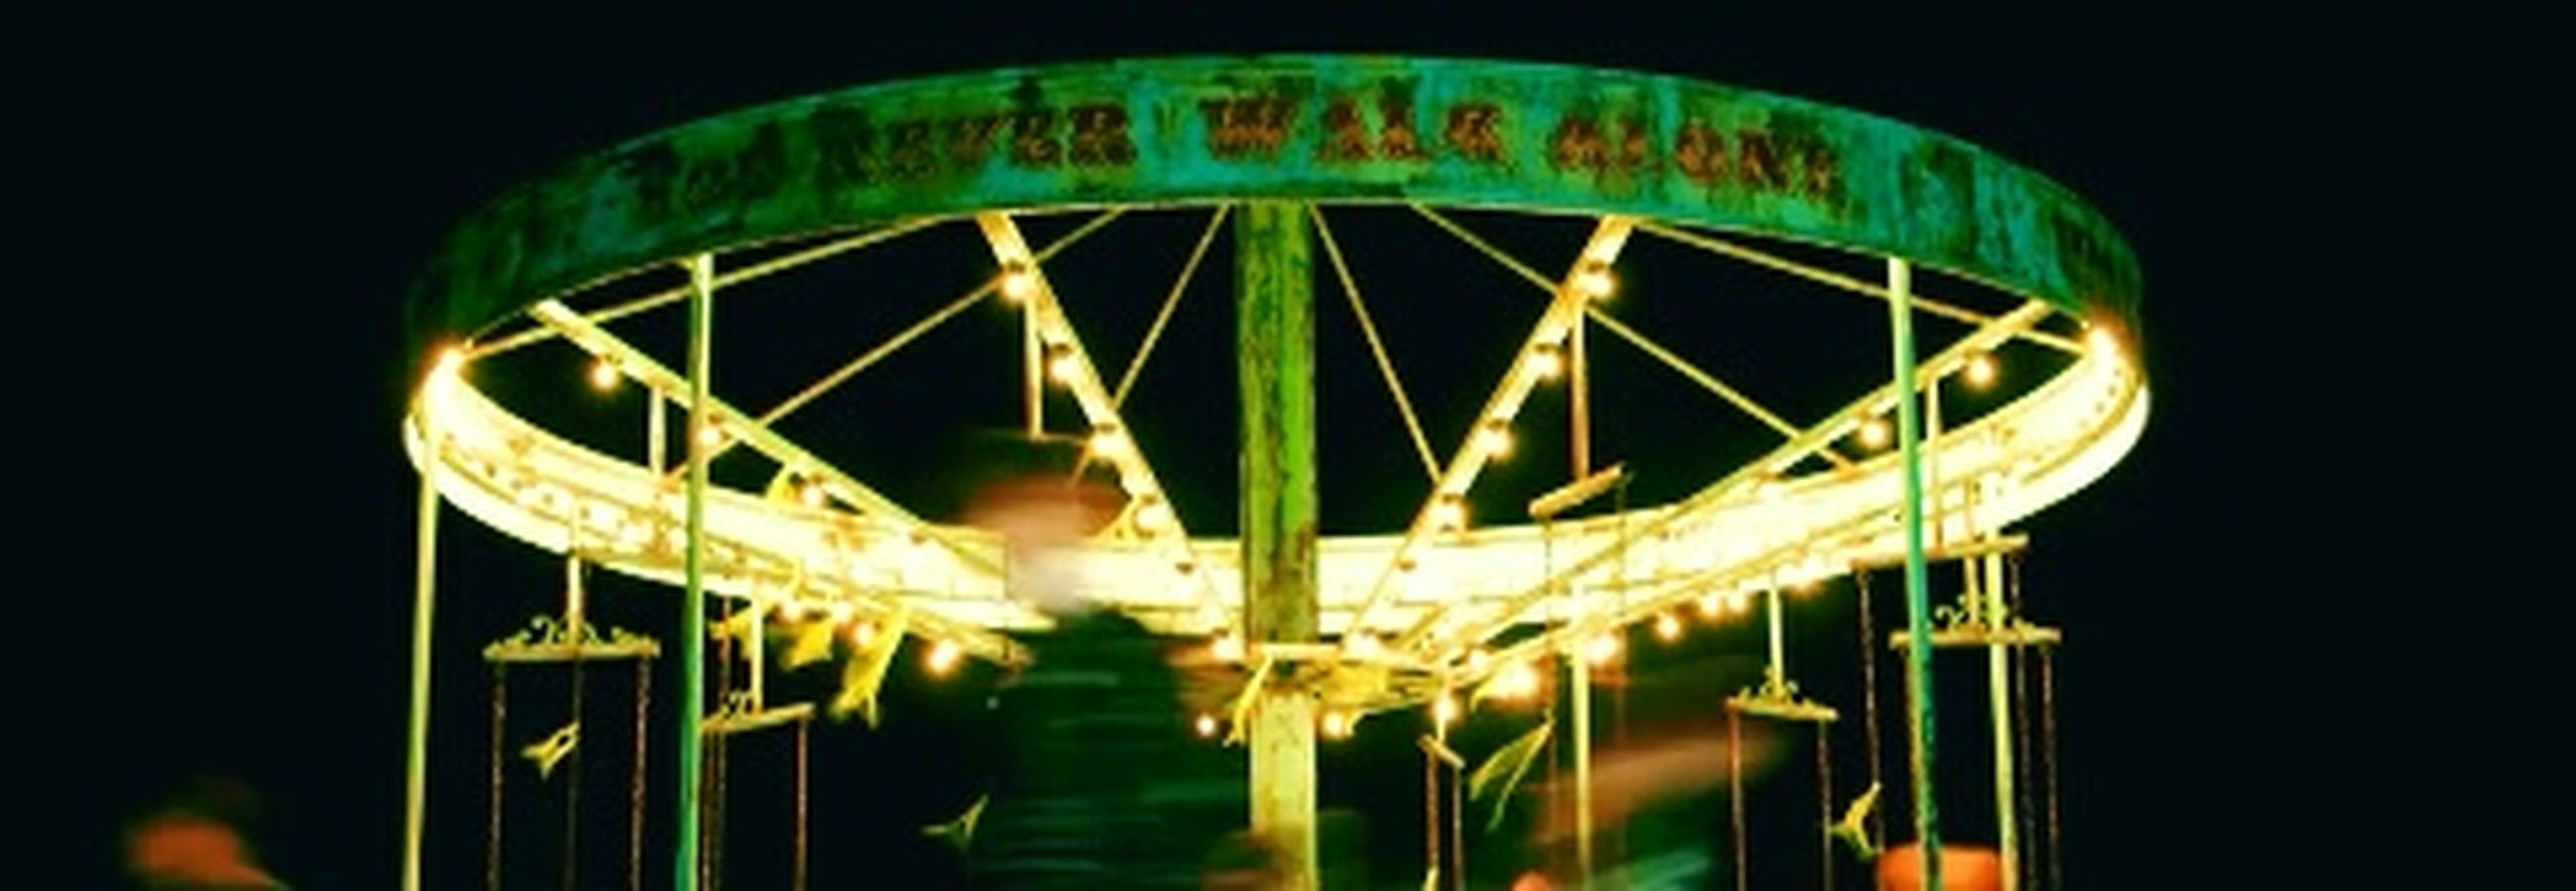 illuminated, night, amusement park, ferris wheel, no people, black background, amusement park ride, close-up, sky, outdoors